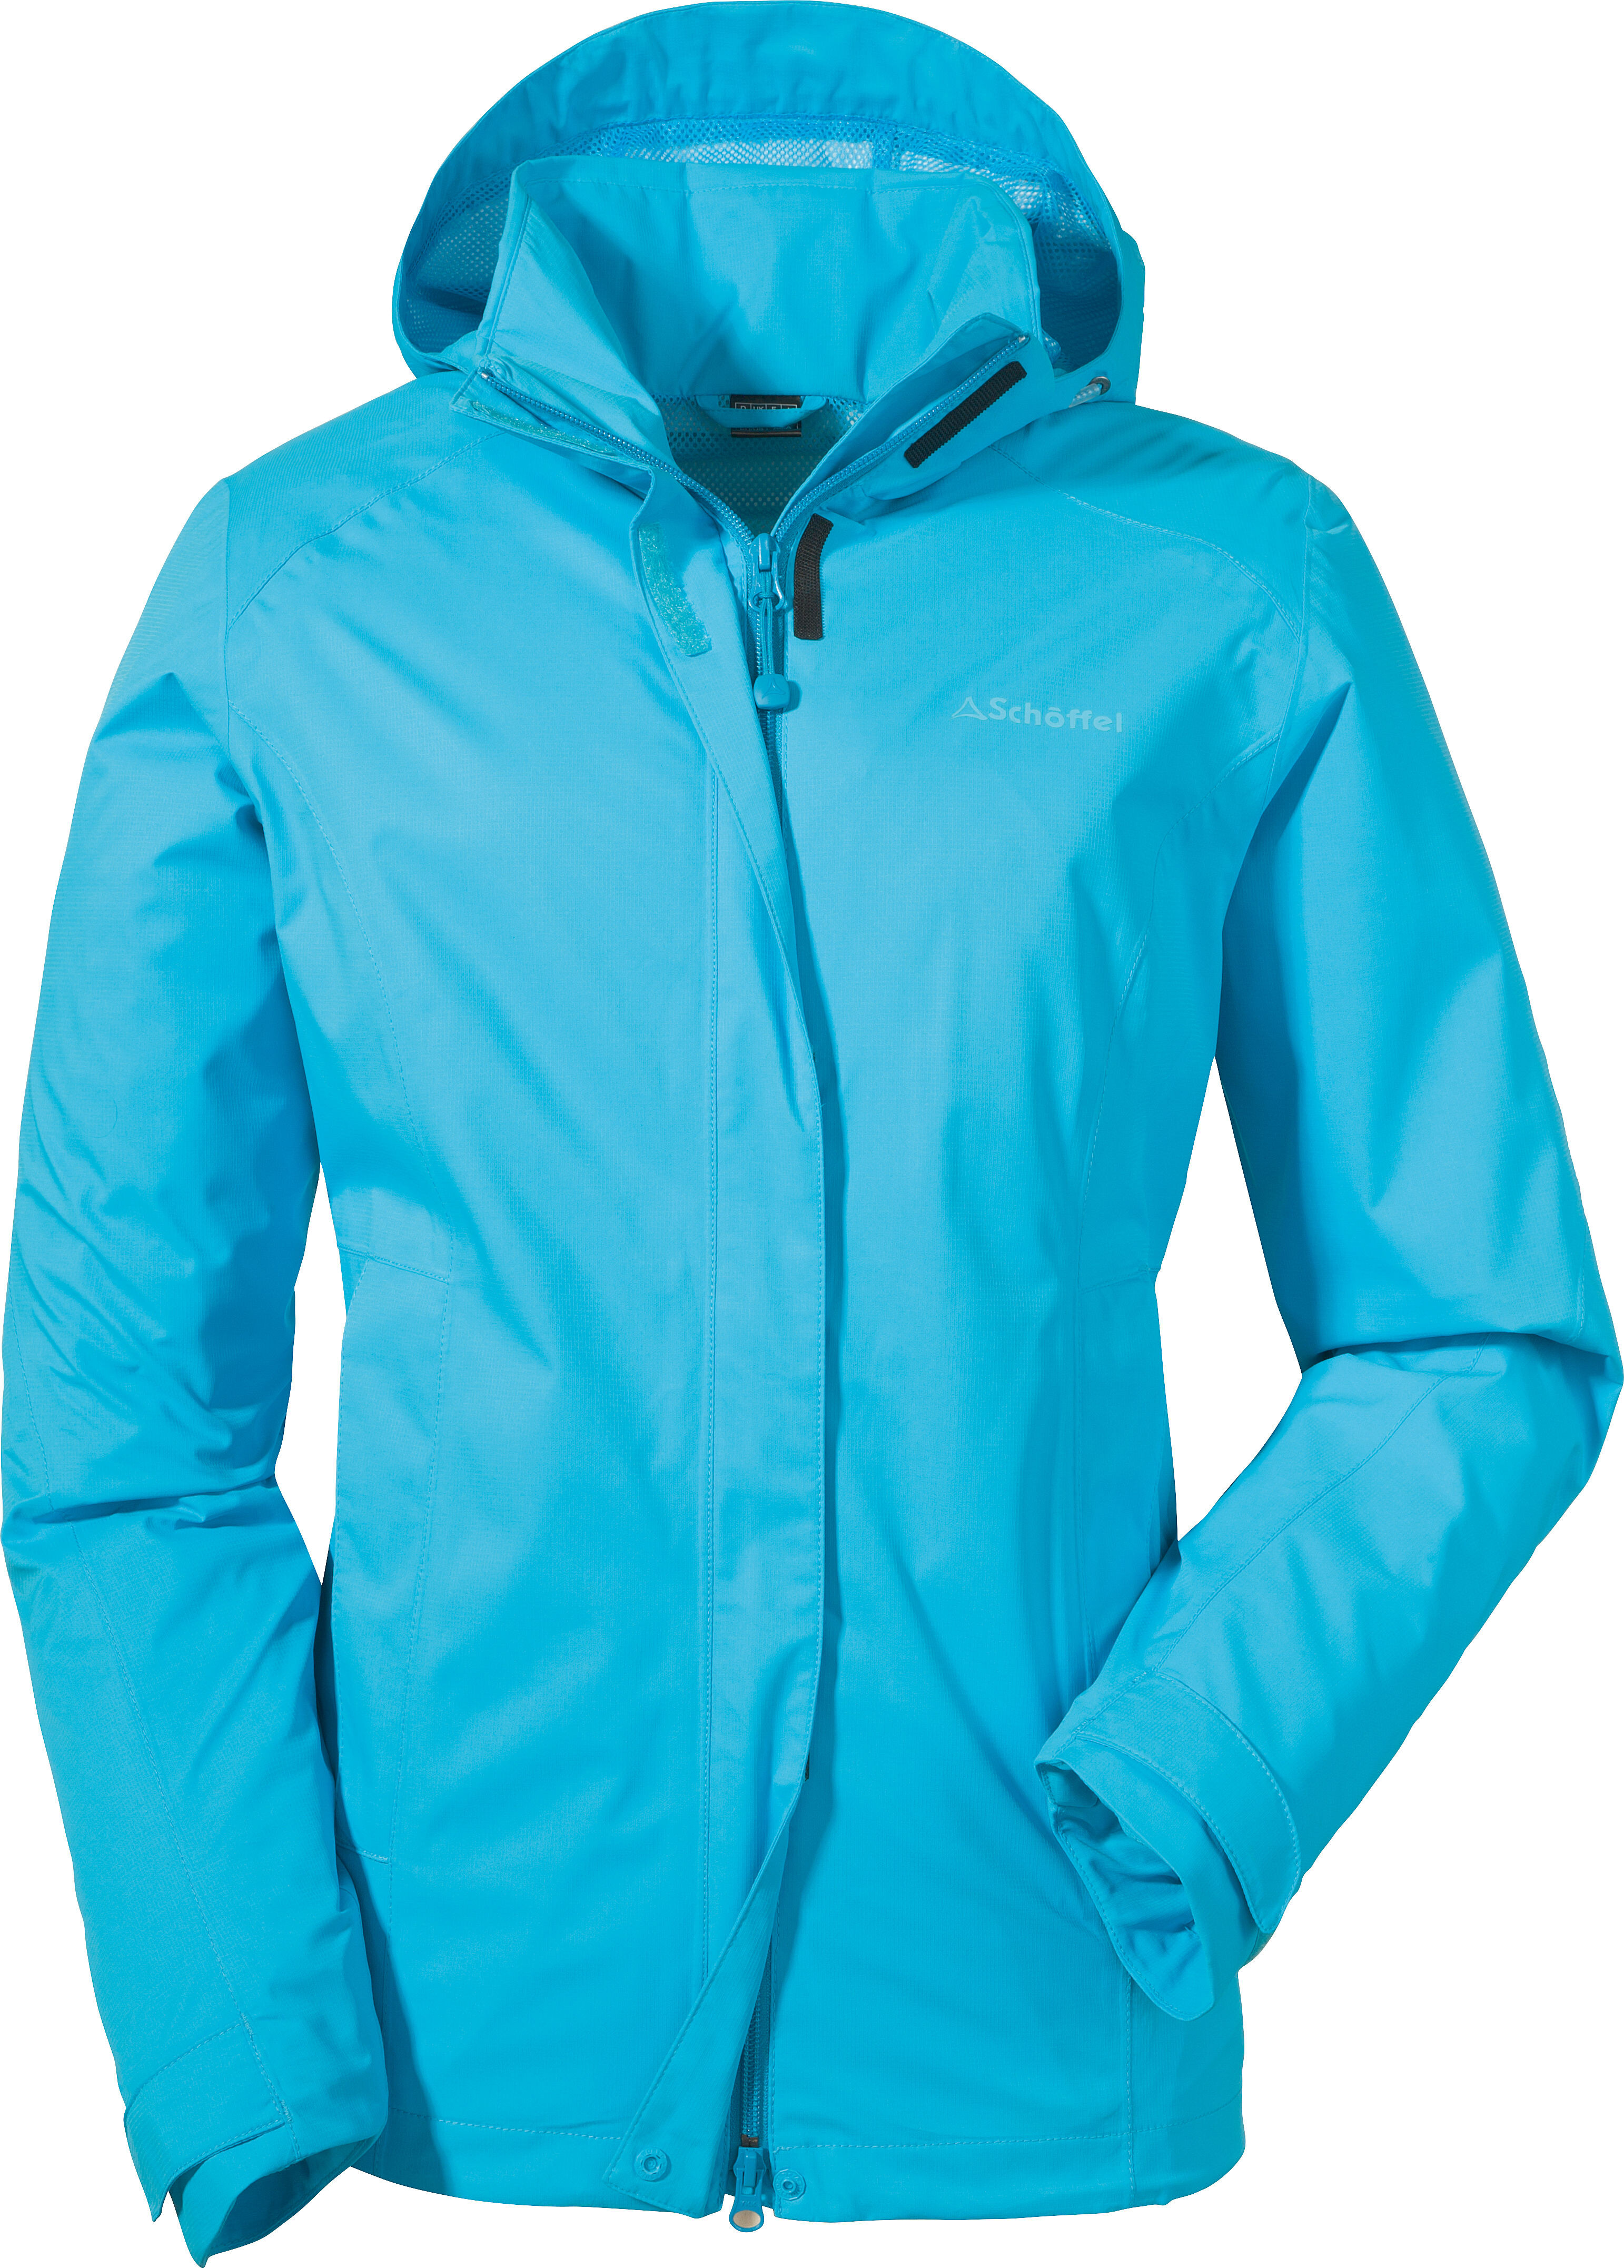 sch ffel easy l 3 jas dames blauw l online bij outdoor shop. Black Bedroom Furniture Sets. Home Design Ideas